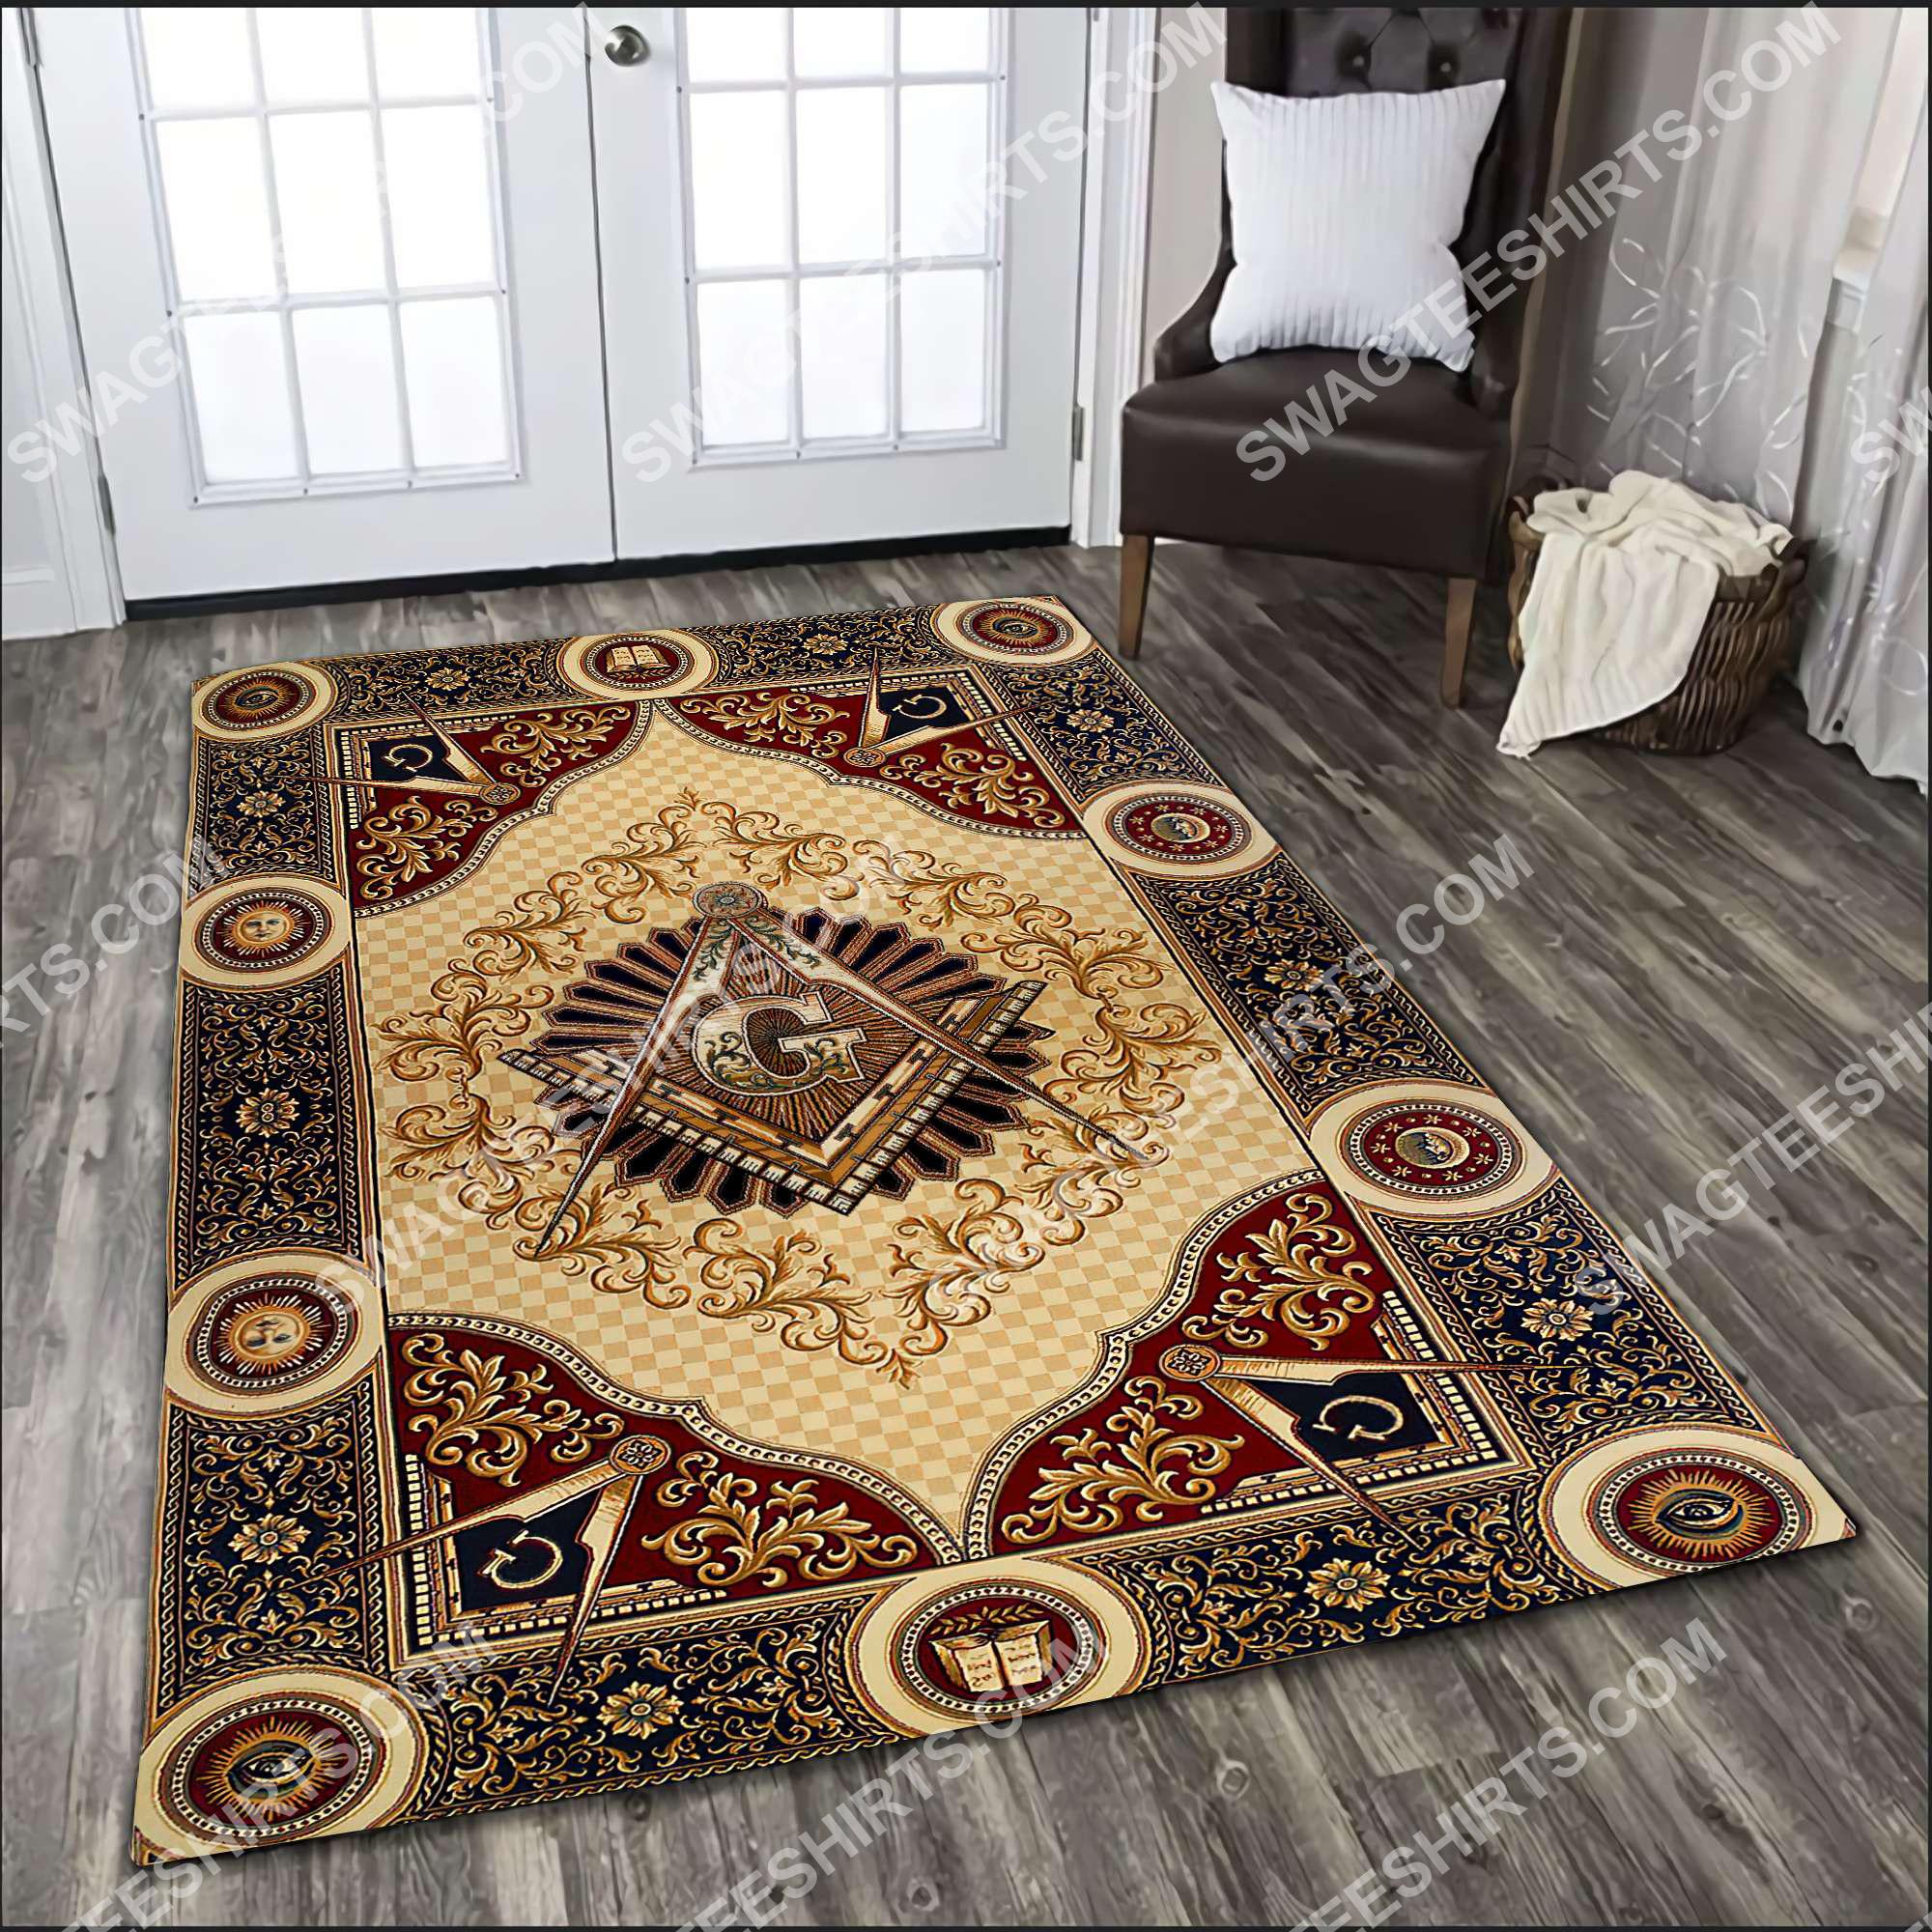 freemasonry masonic lodges all over printed rug 3(1)